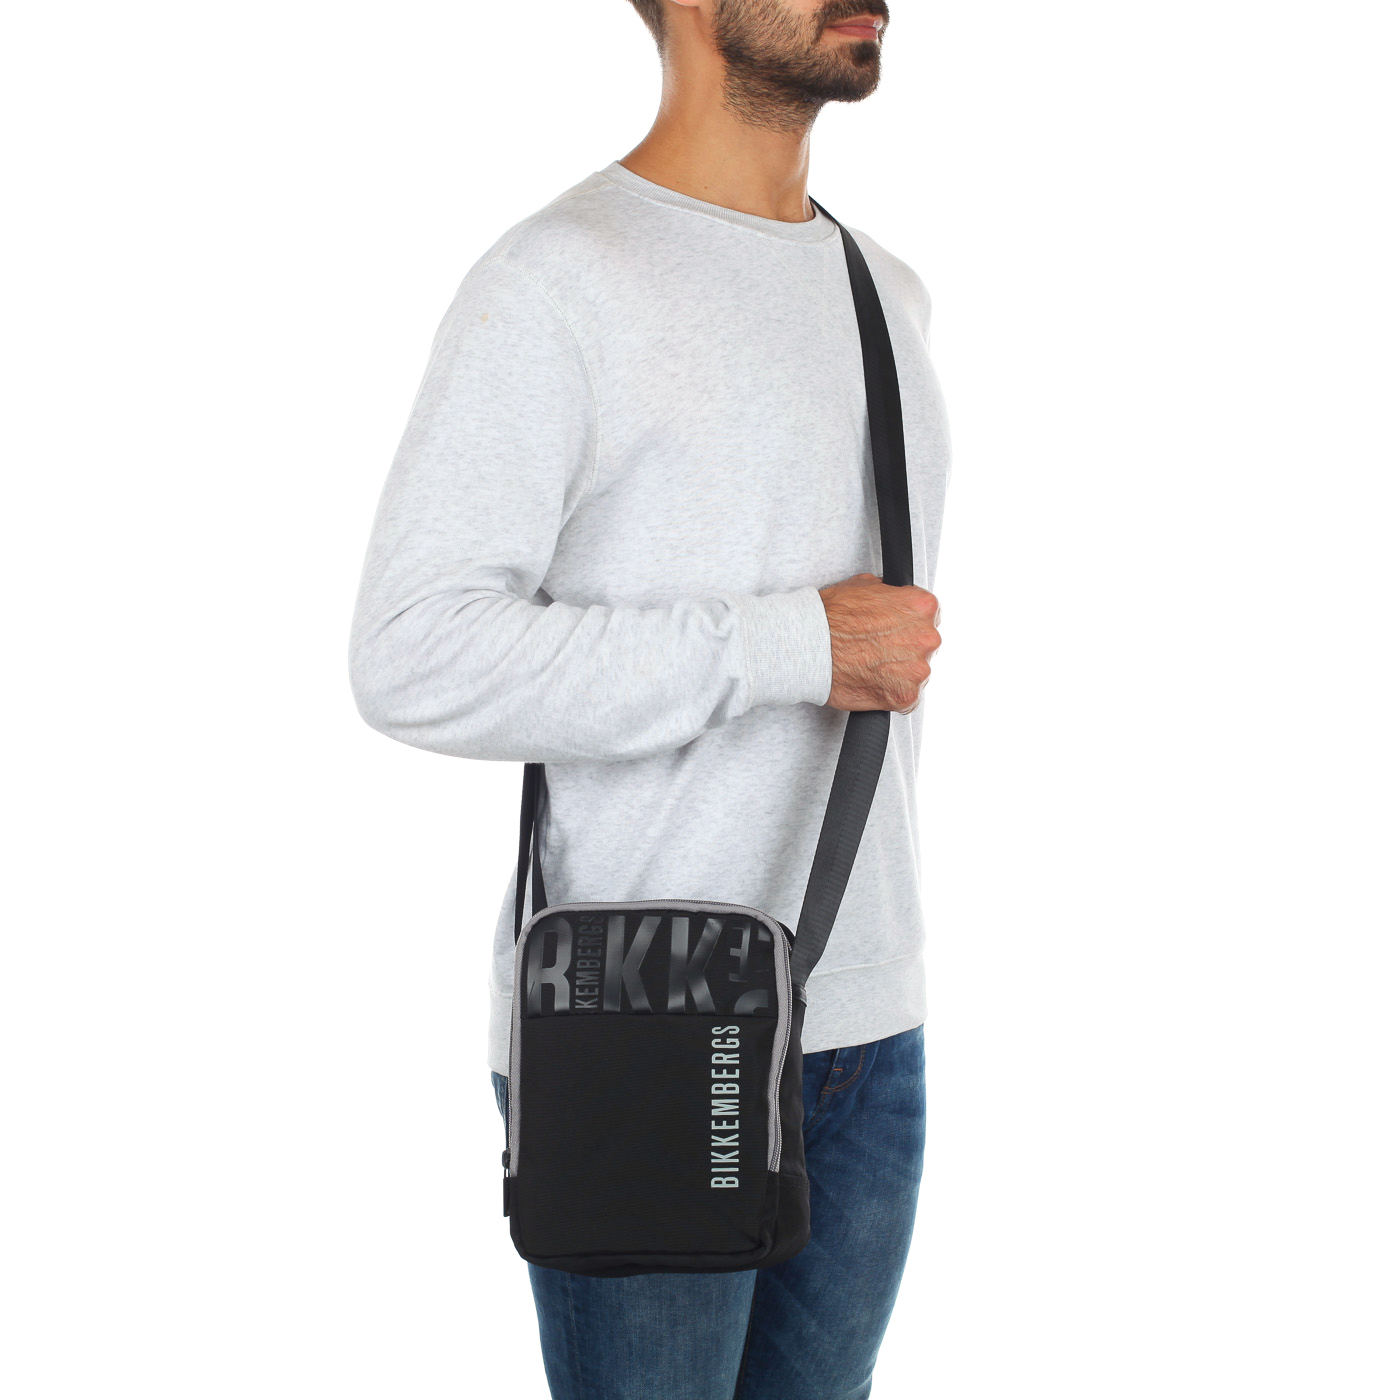 af037c8a36fe Мужская сумка через плечо Bikkembergs 6BDD4904_black - 2000557774551 ...